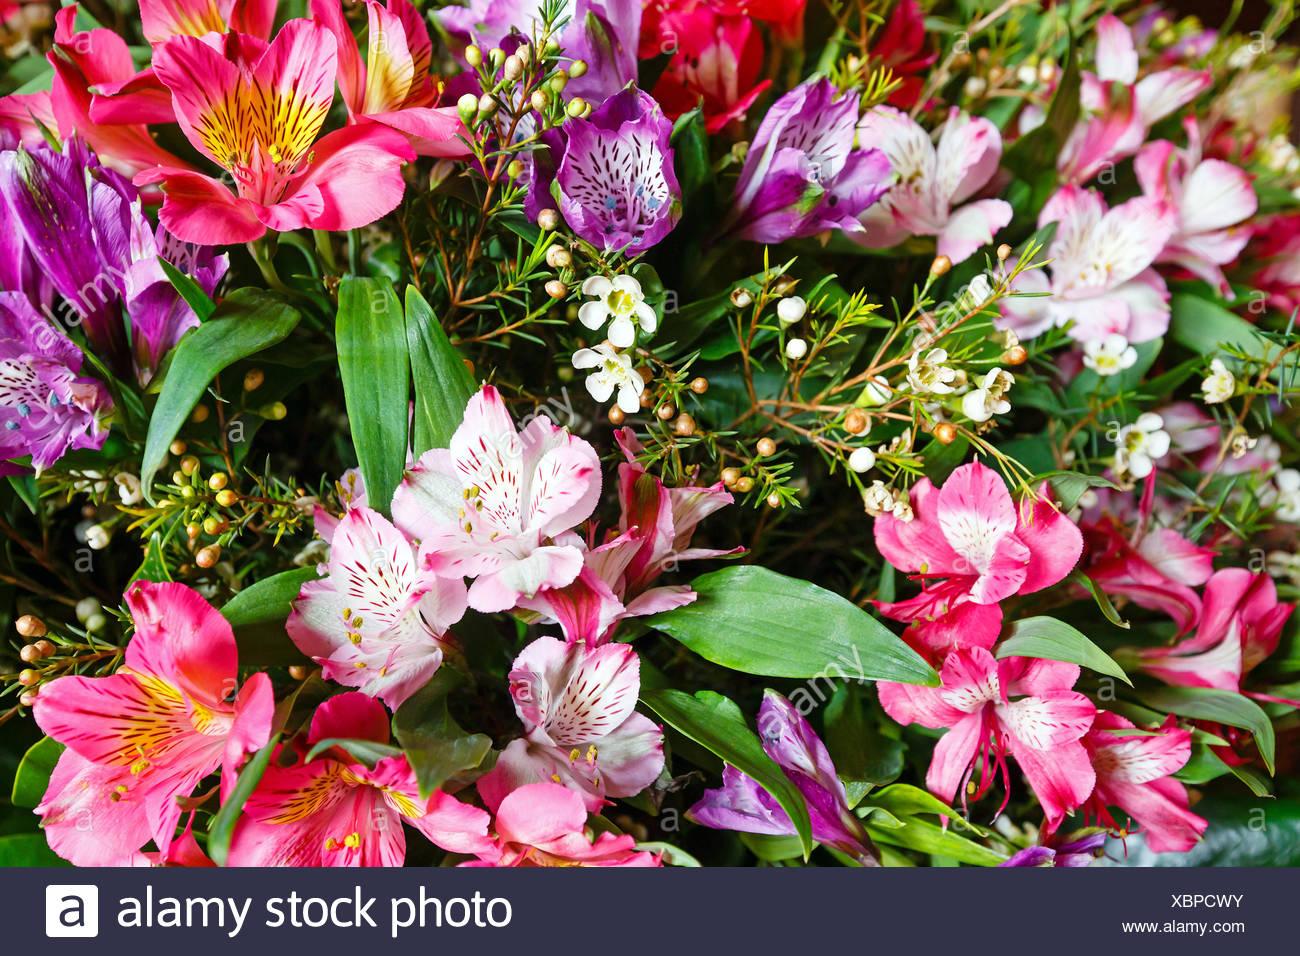 Big Multicolor Alstroemeria Flowers Bouquet Stock Photo 282620183